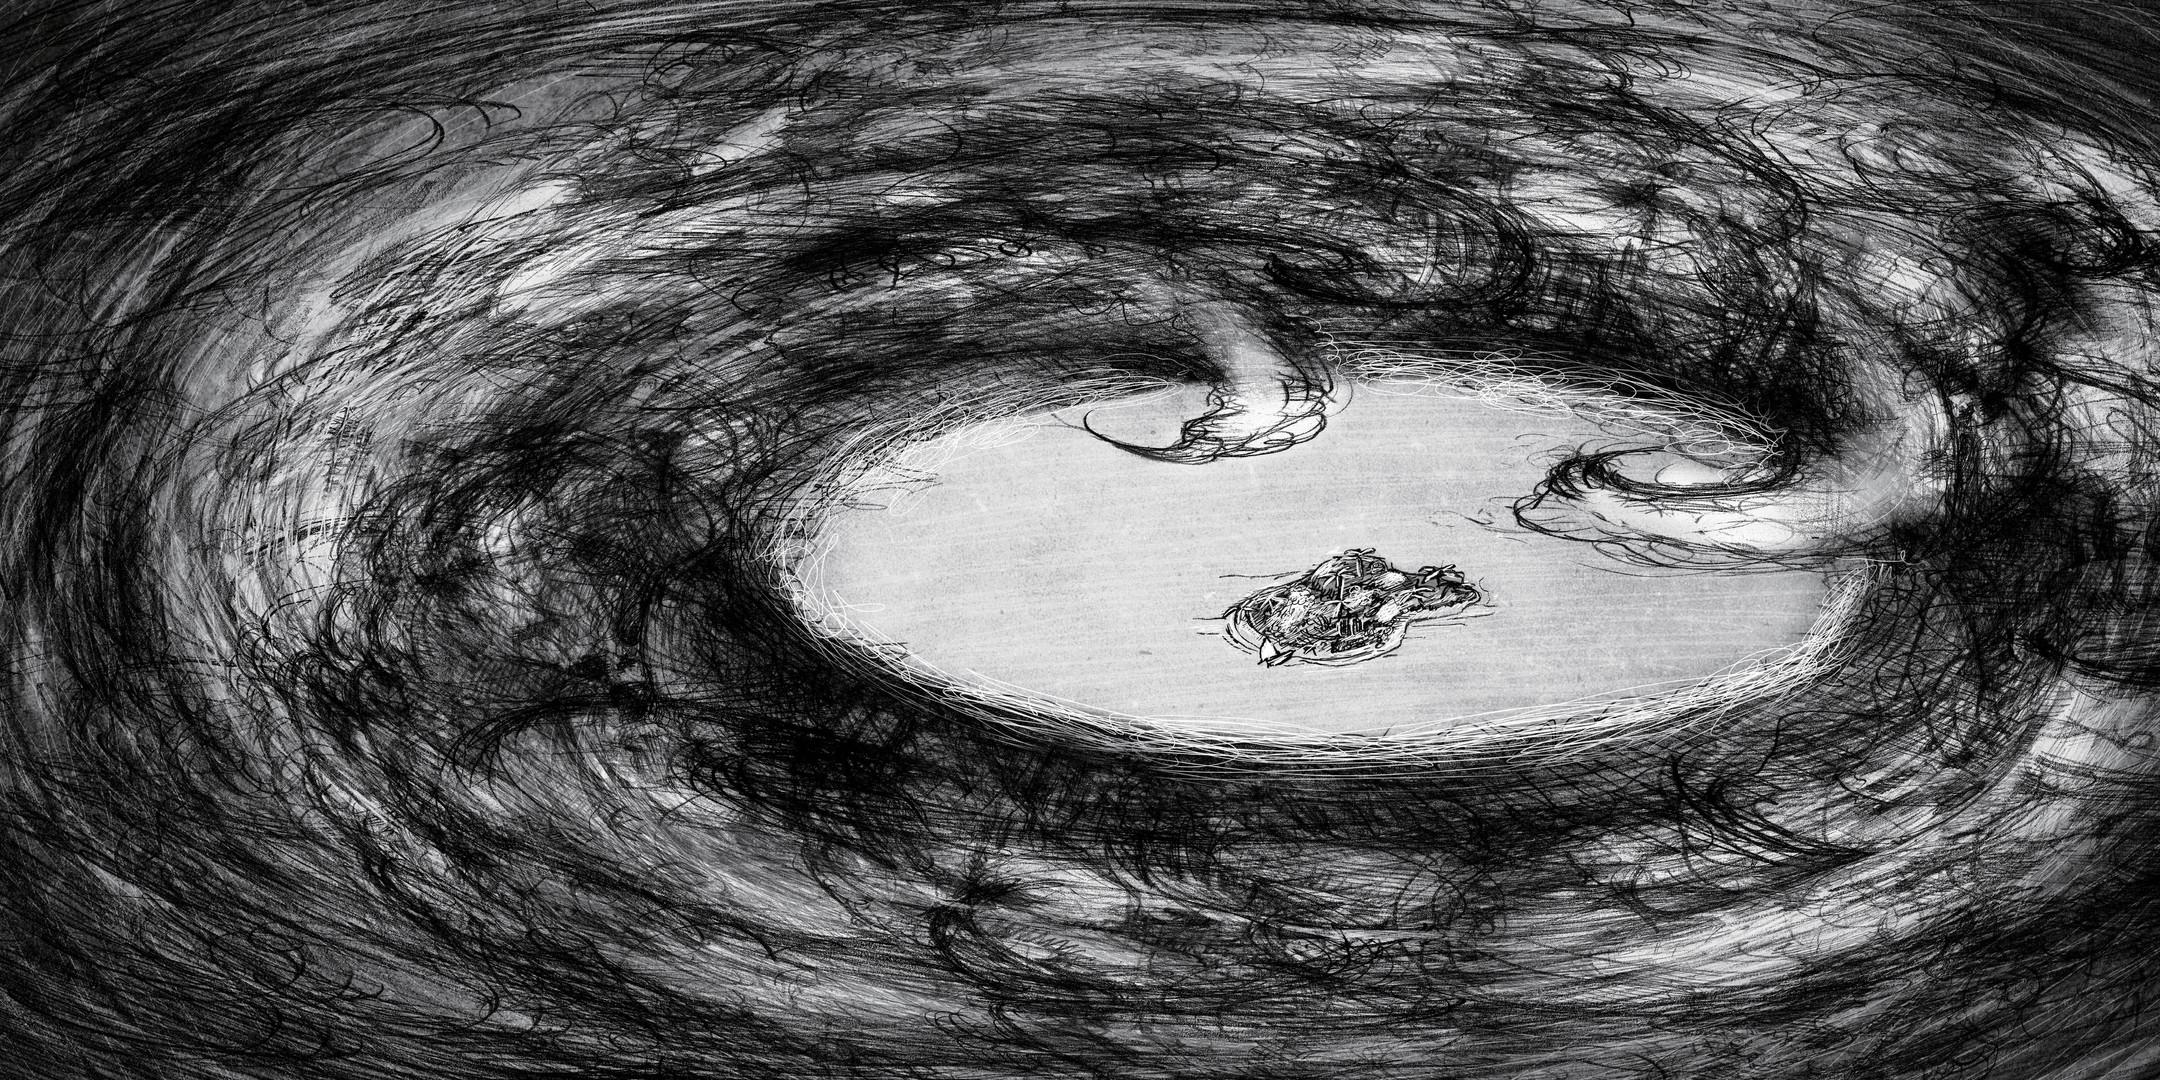 The Boy Mermaid & Storm_10x107.jpg